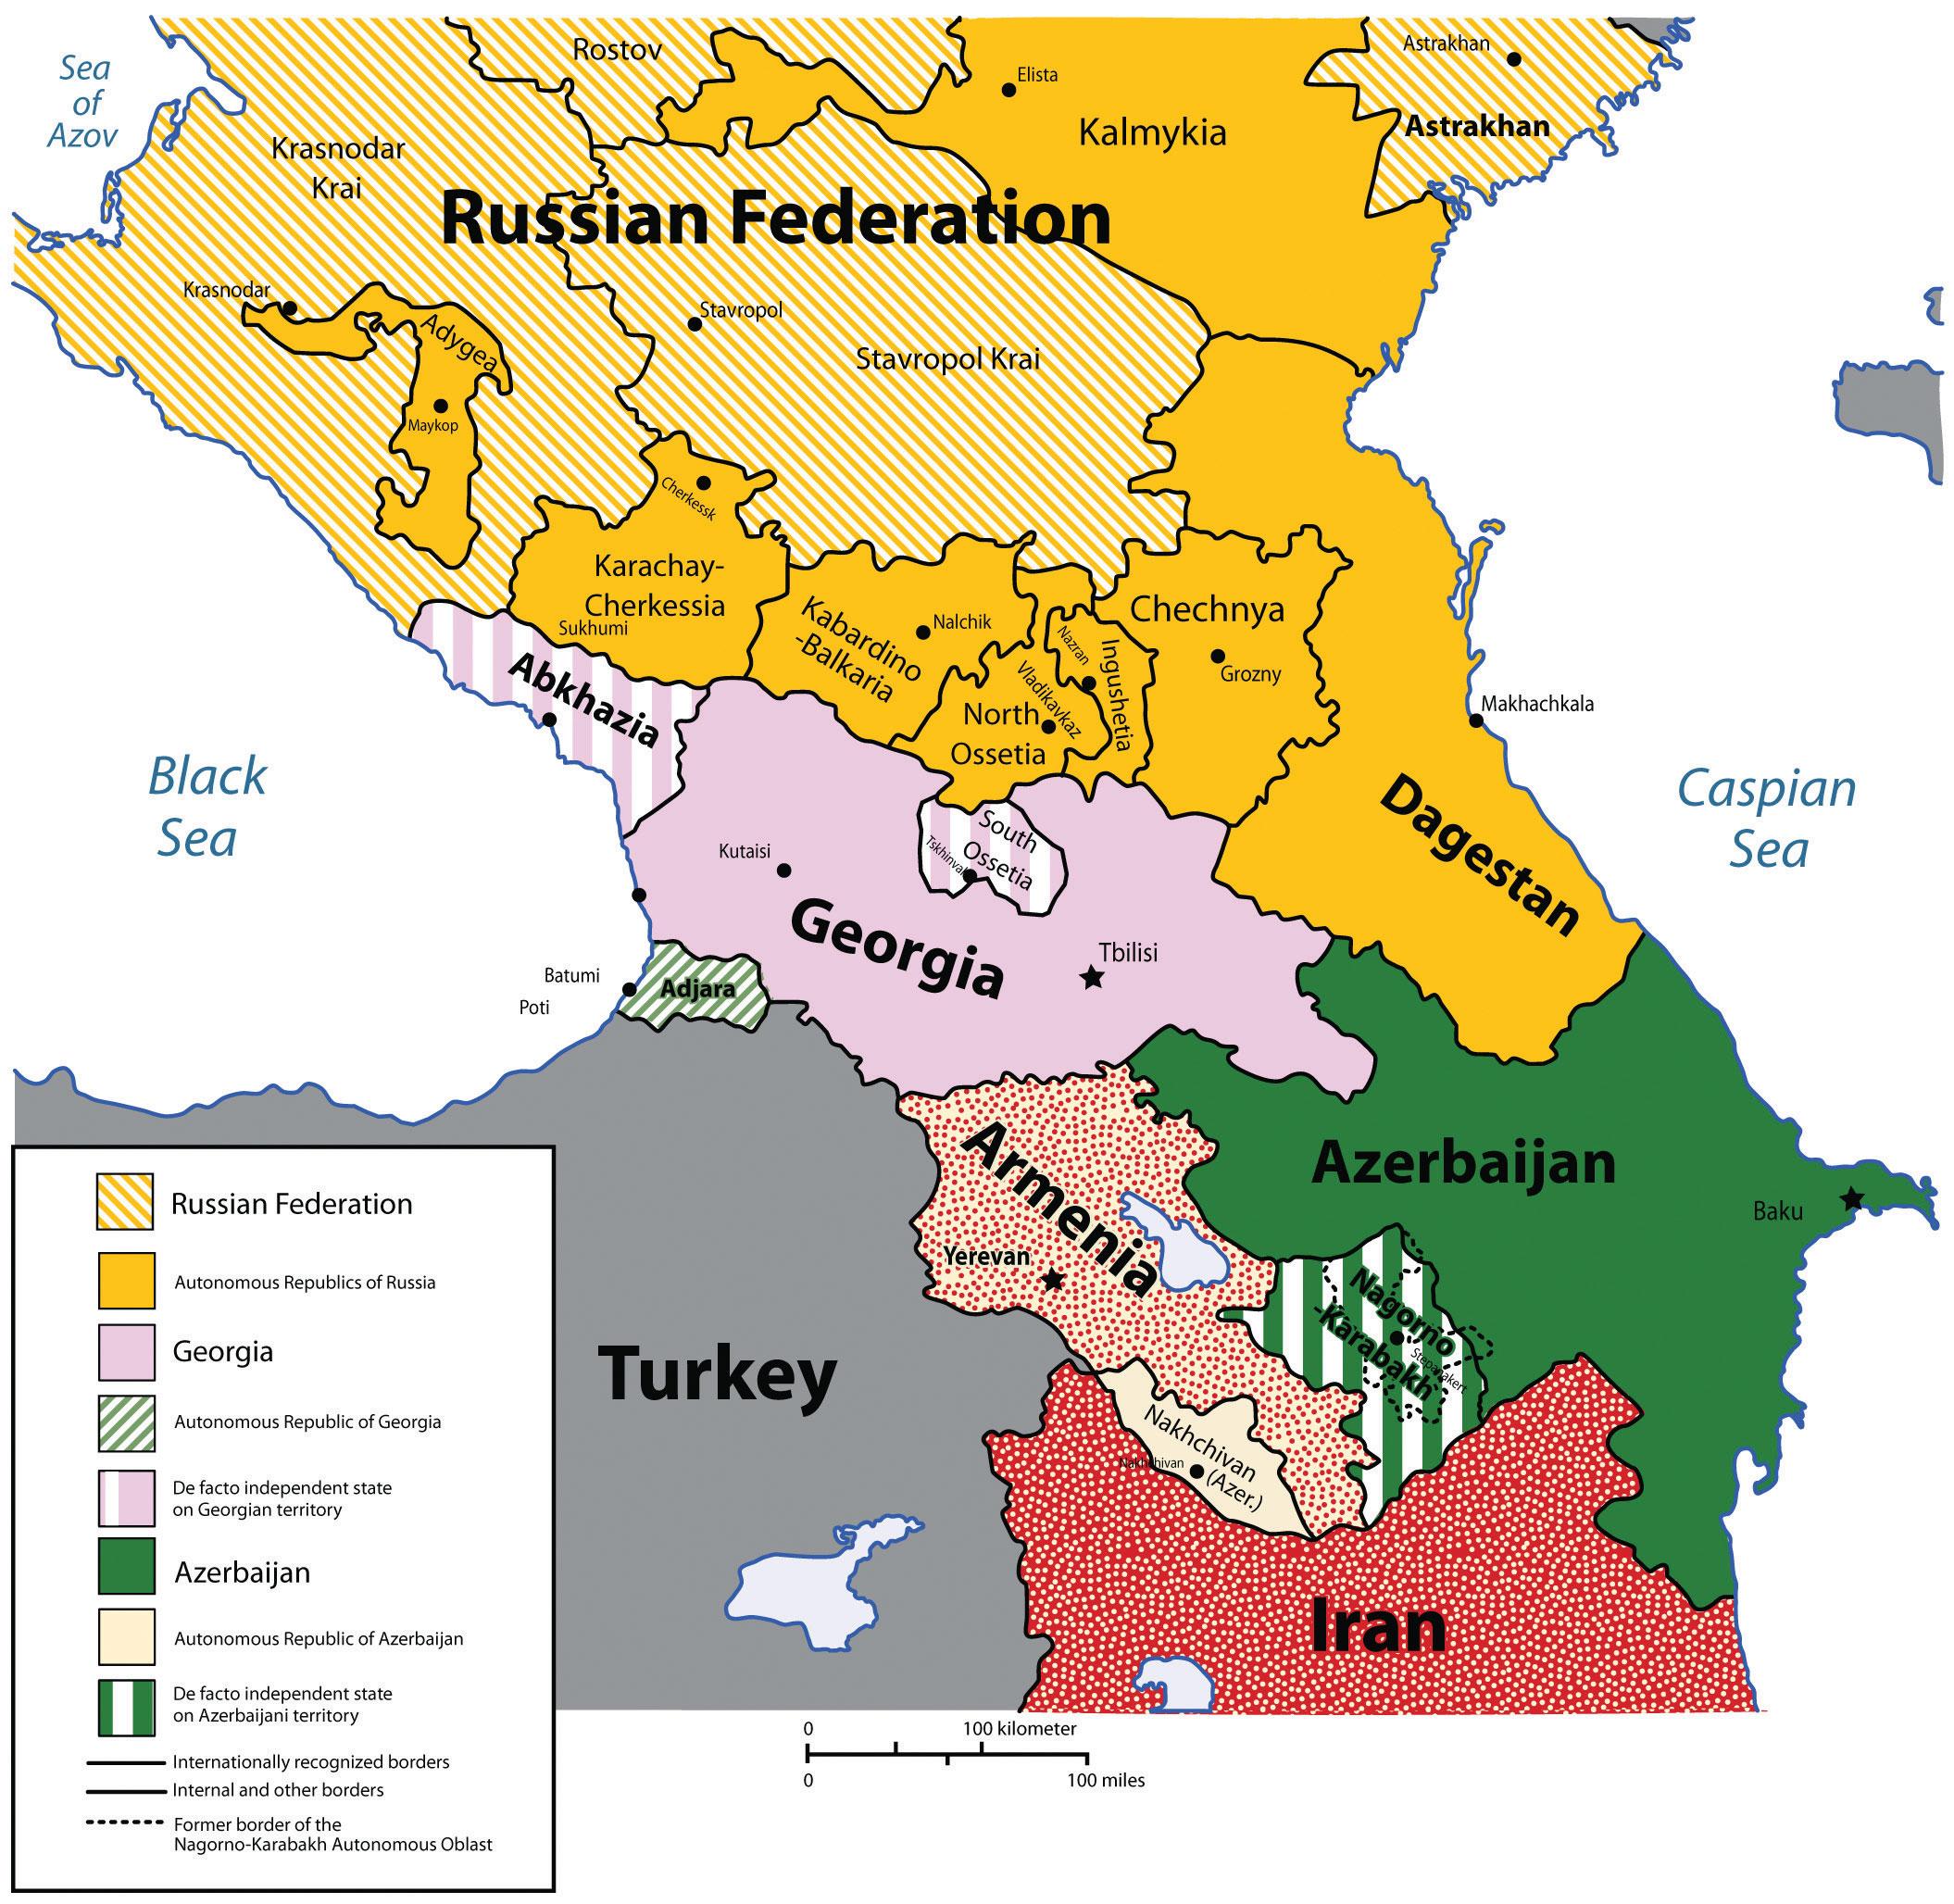 Regions of Russia